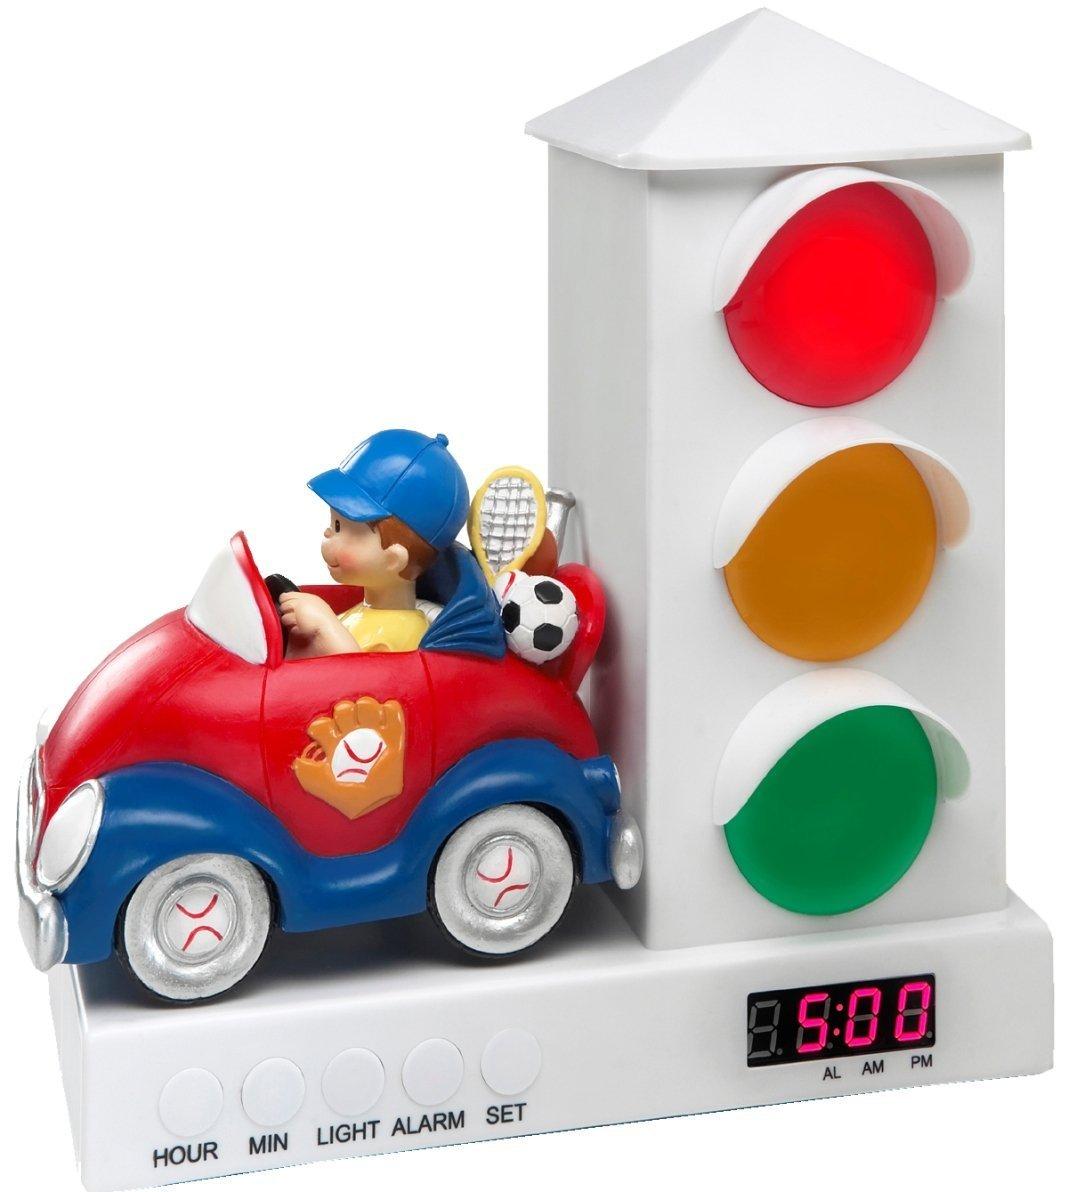 kids alarm clock - Sleepyhead Consulting